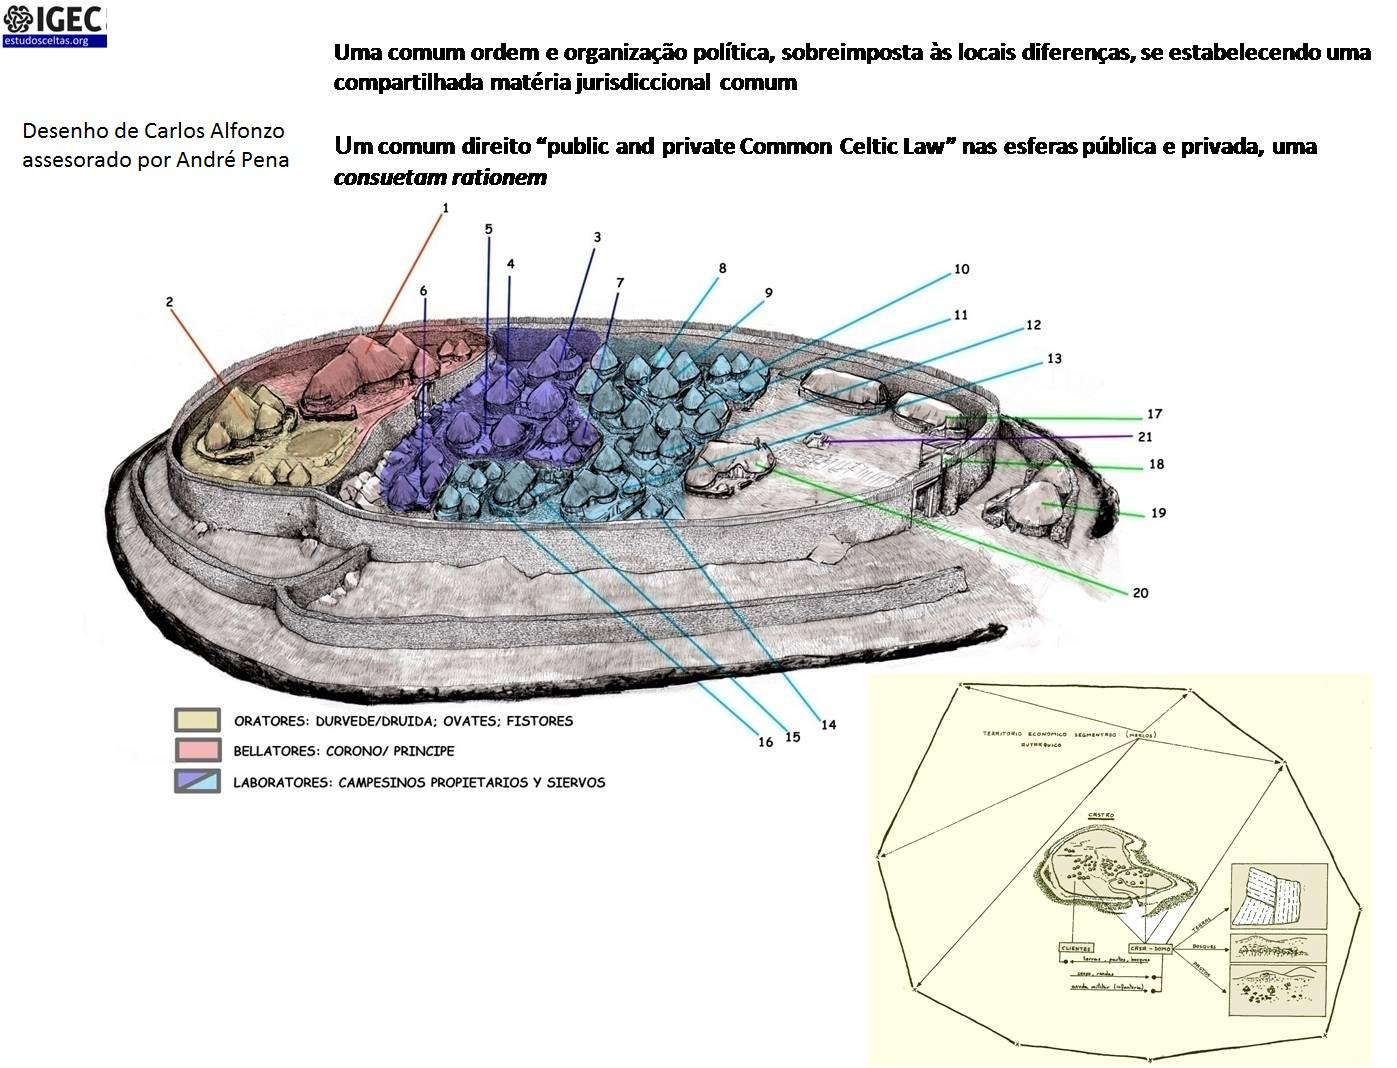 imagen1.jpg